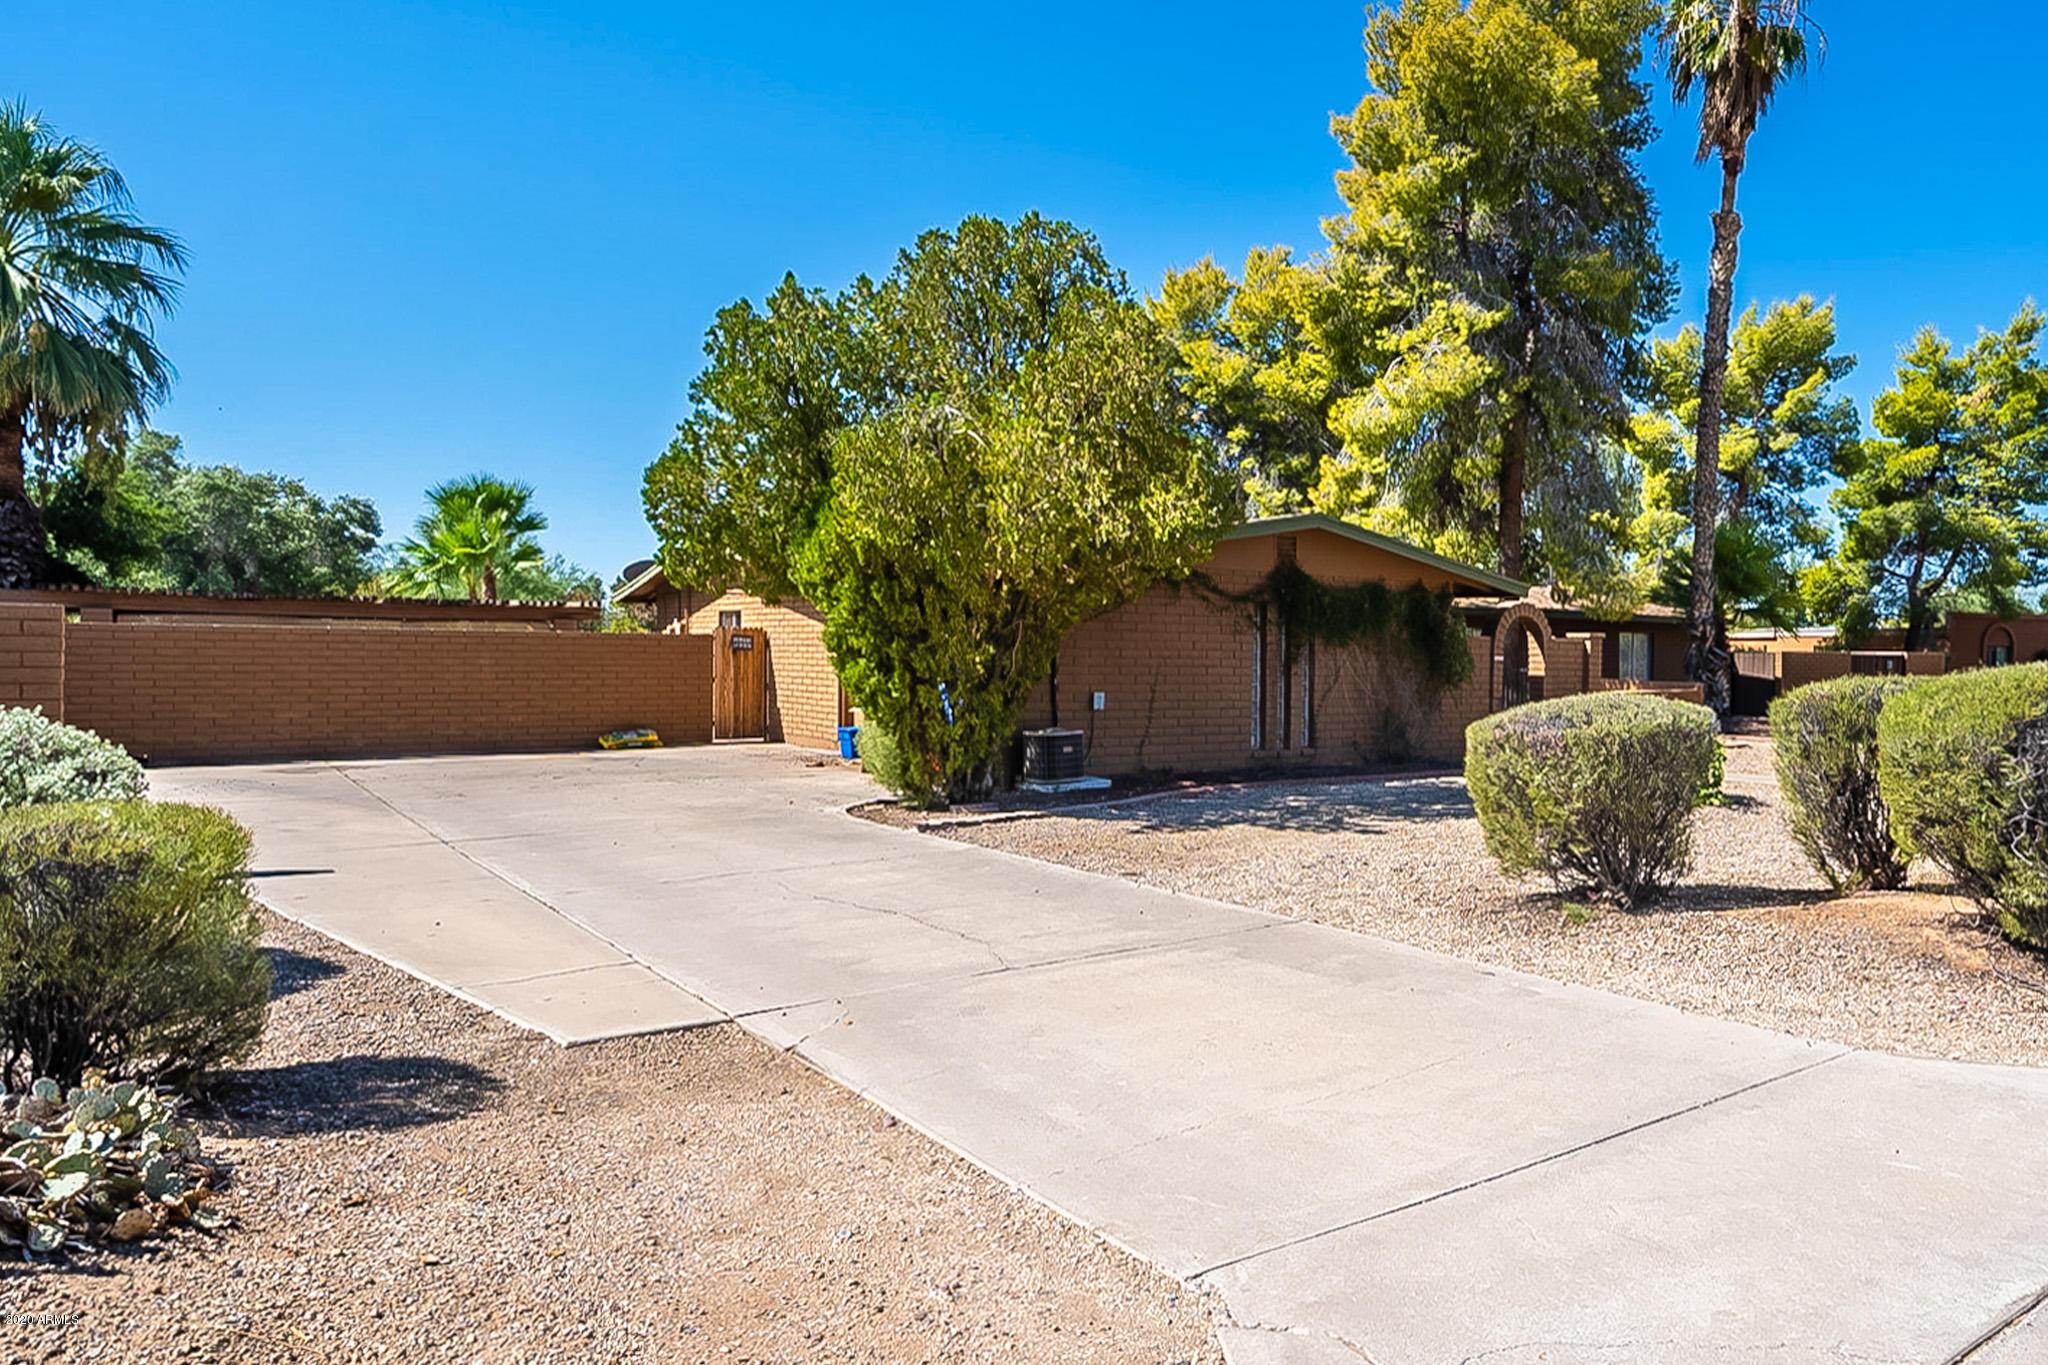 MLS 6130586 6125 E Surrey Avenue, Scottsdale, AZ 85254 Scottsdale AZ Private Pool